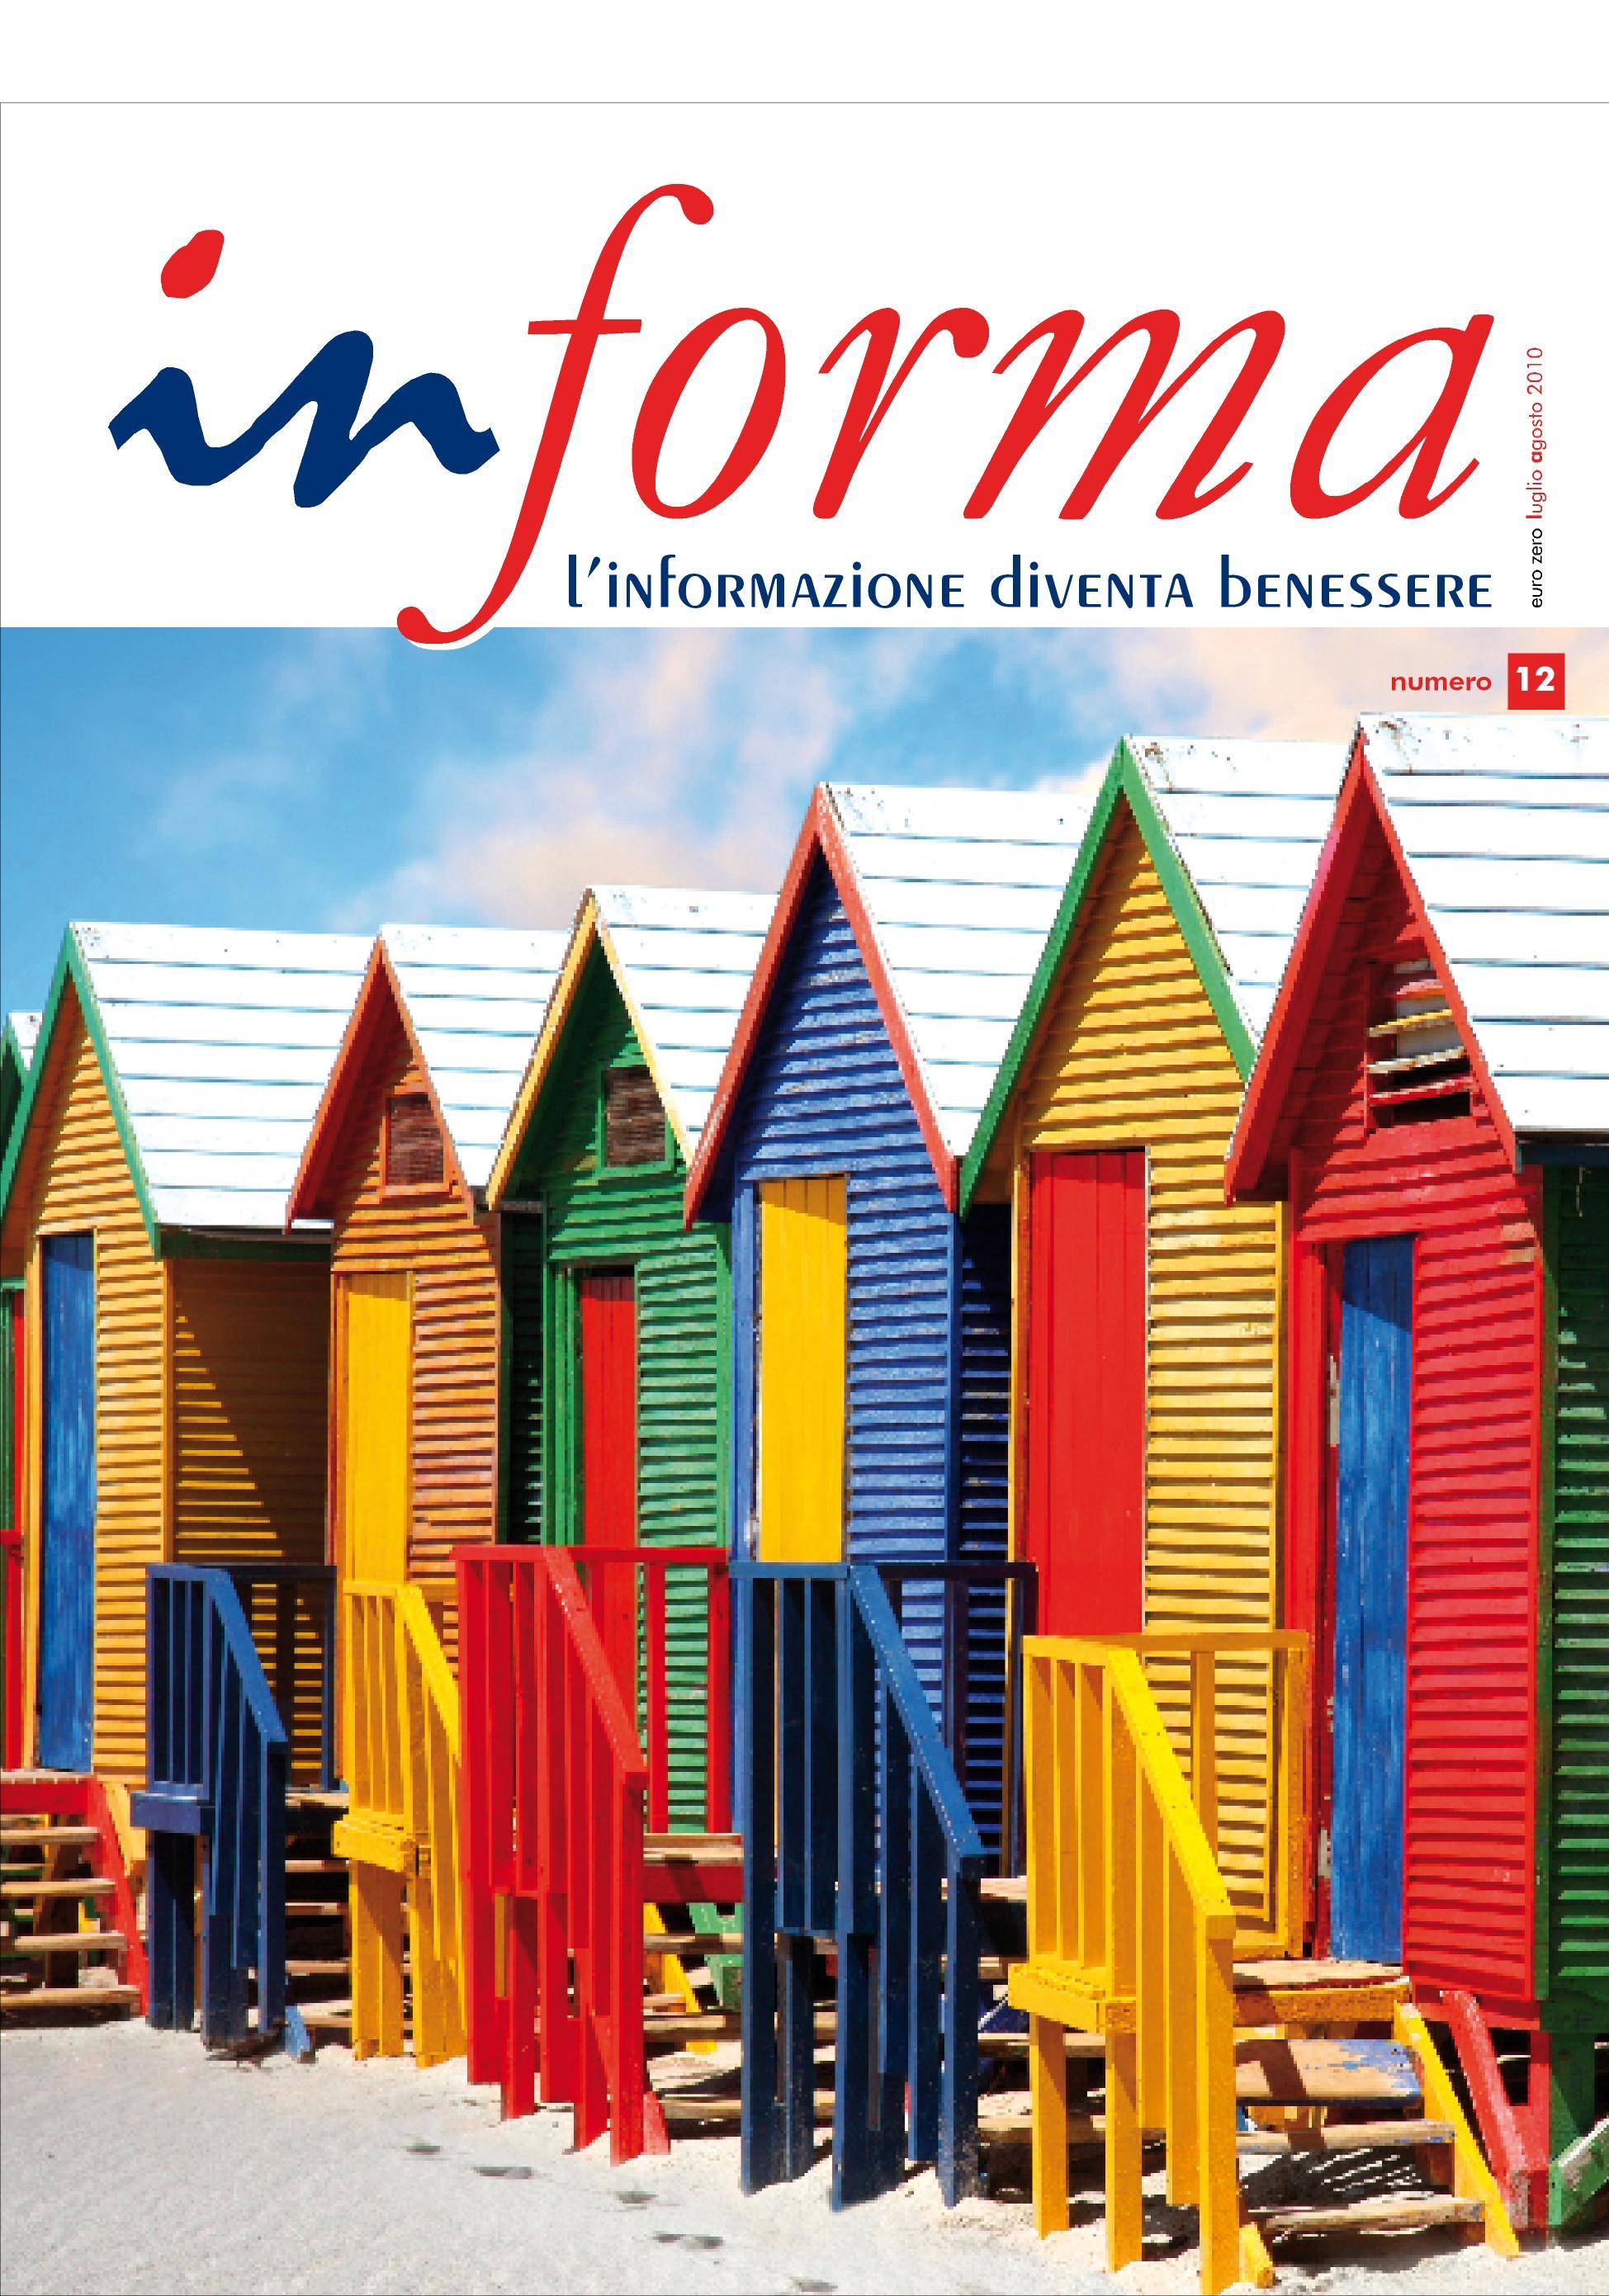 La copertina rappresenta una serie di case colorate